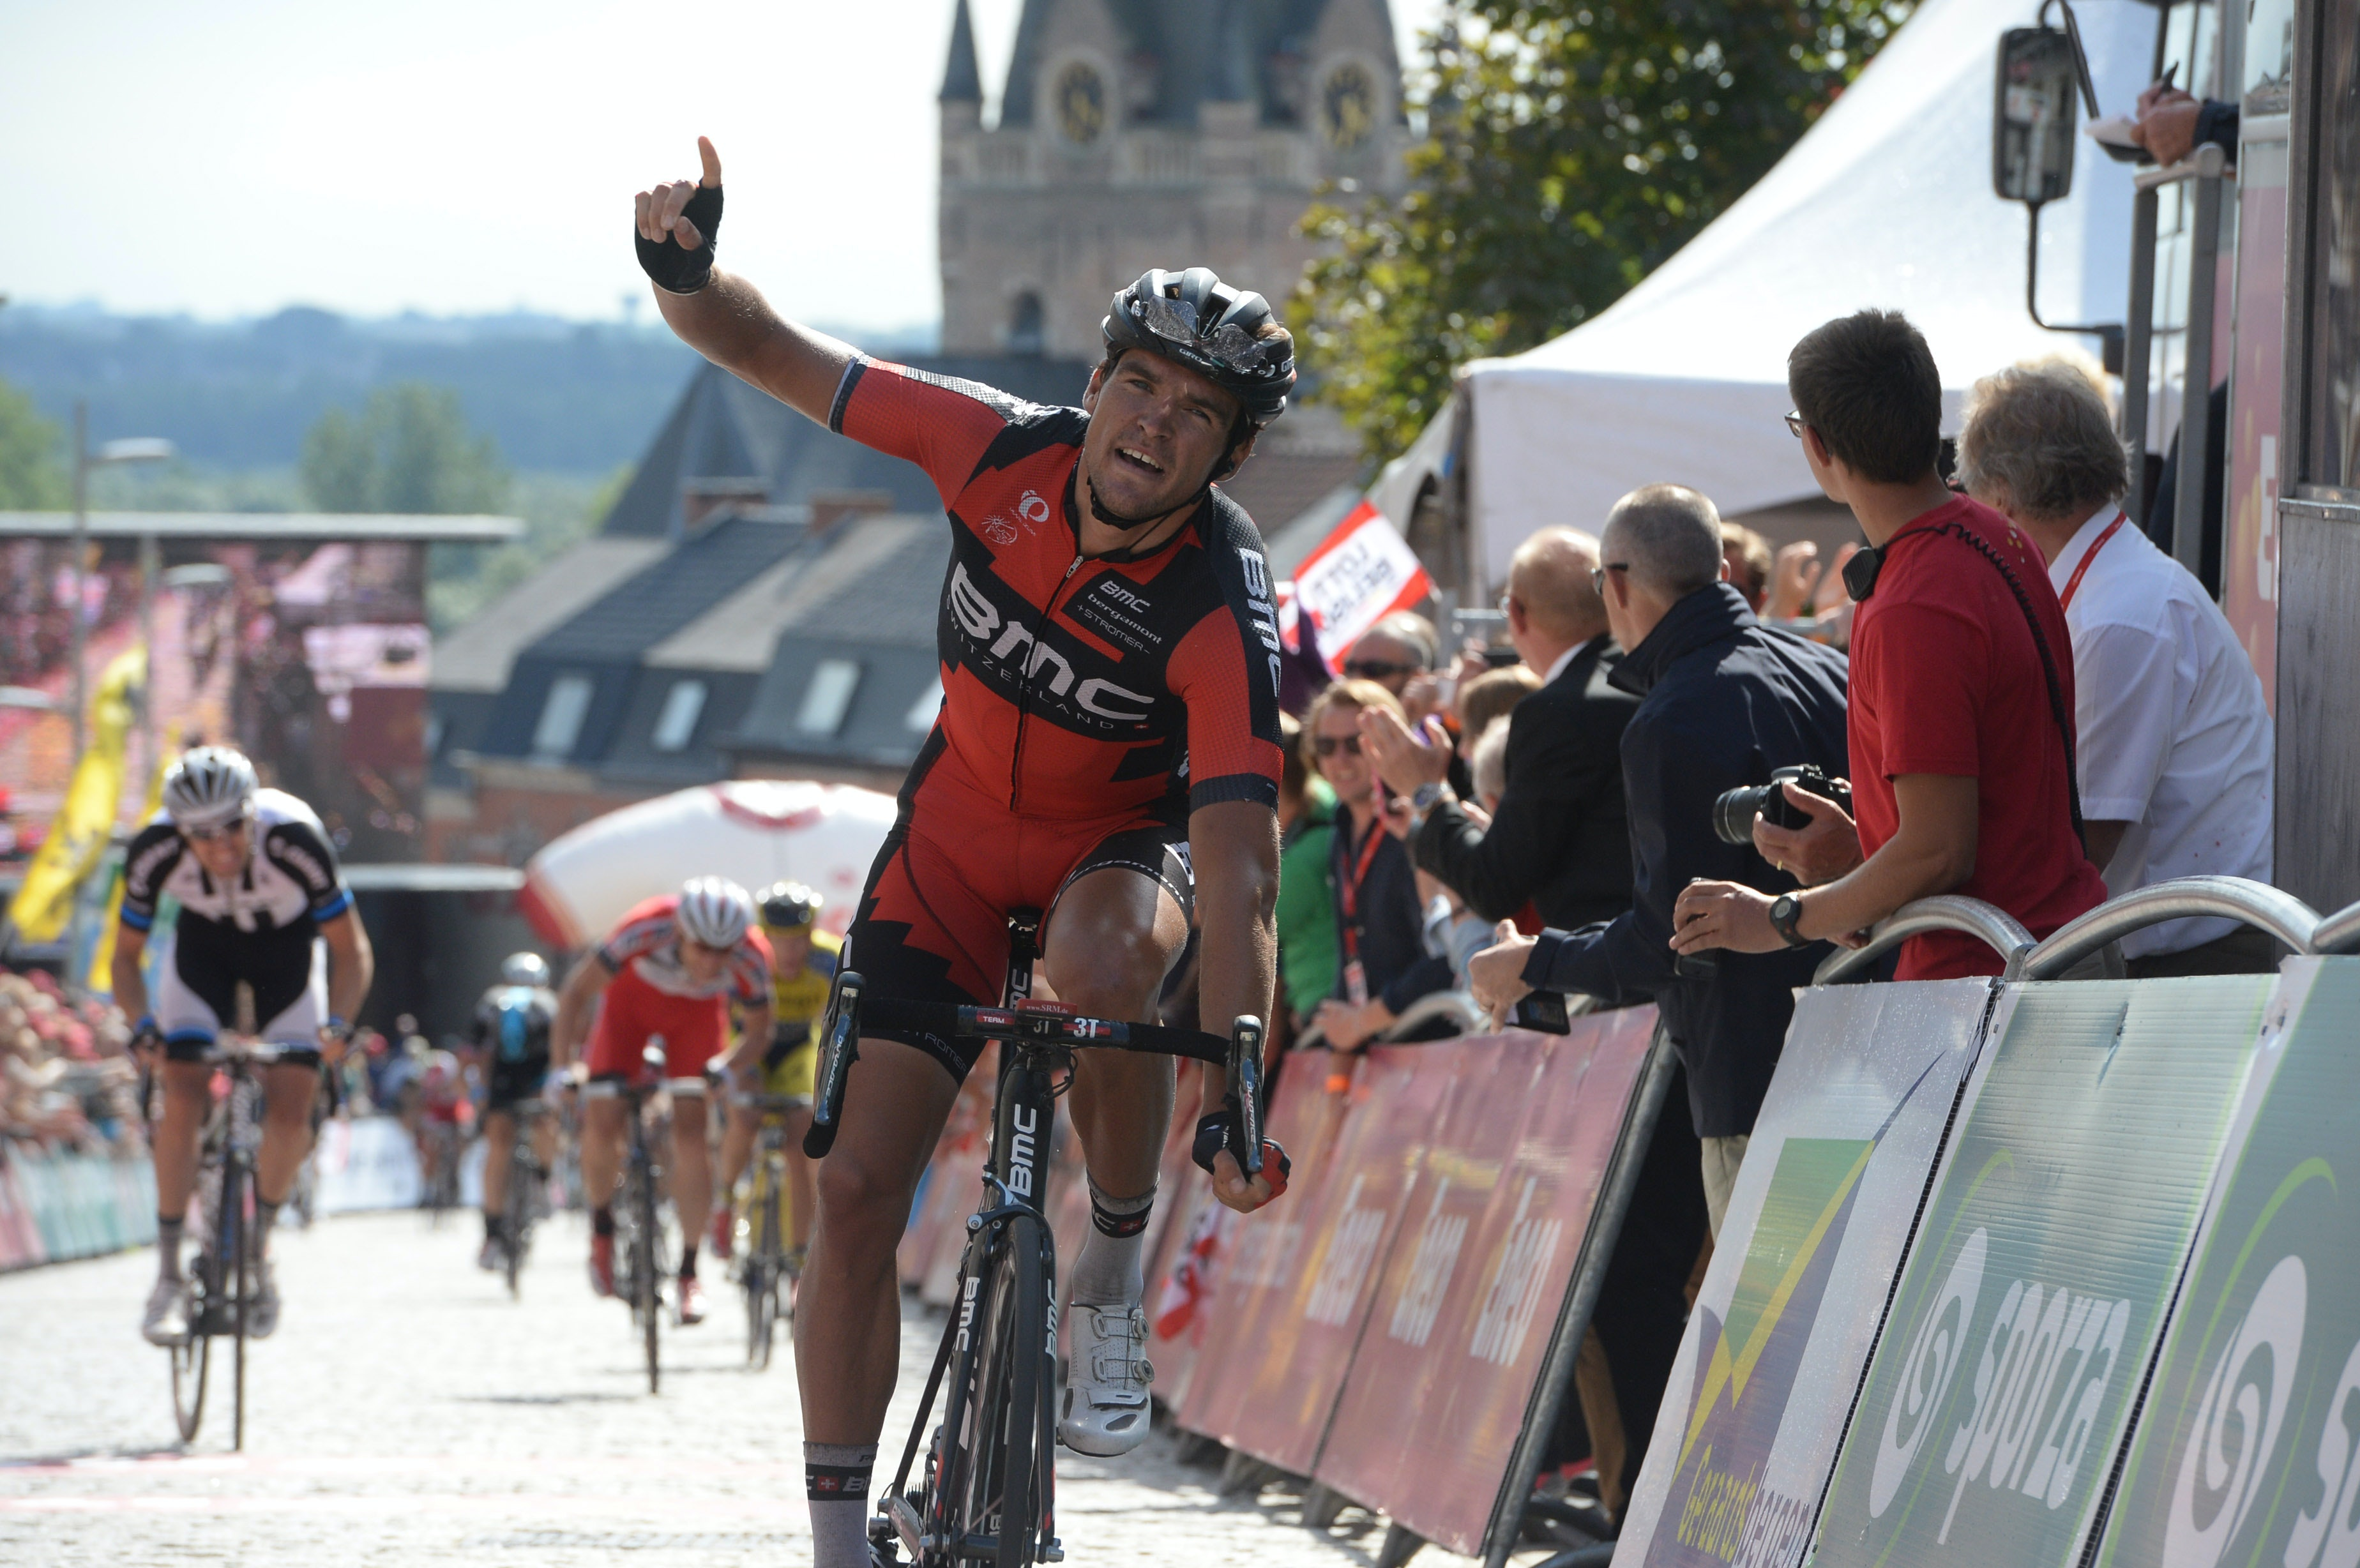 Greg Van Avermaet, BMC Racing, Eneco Tour 2014 (Pic: Sirotti)